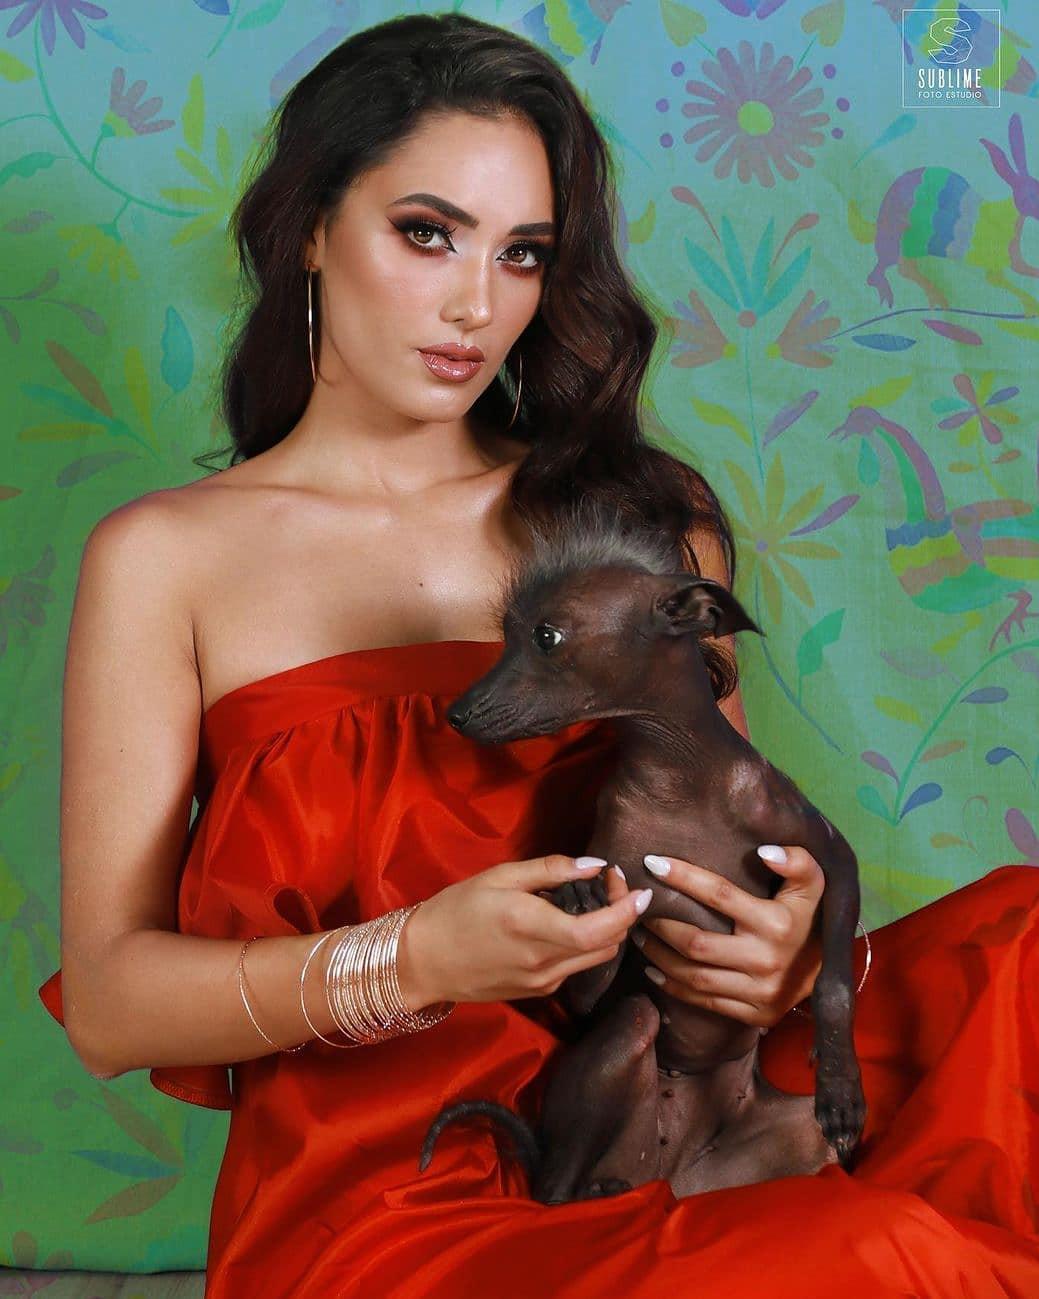 karolina vidales, candidata a miss mexico 2021, representando michoacan. - Página 10 Bm0ccx10